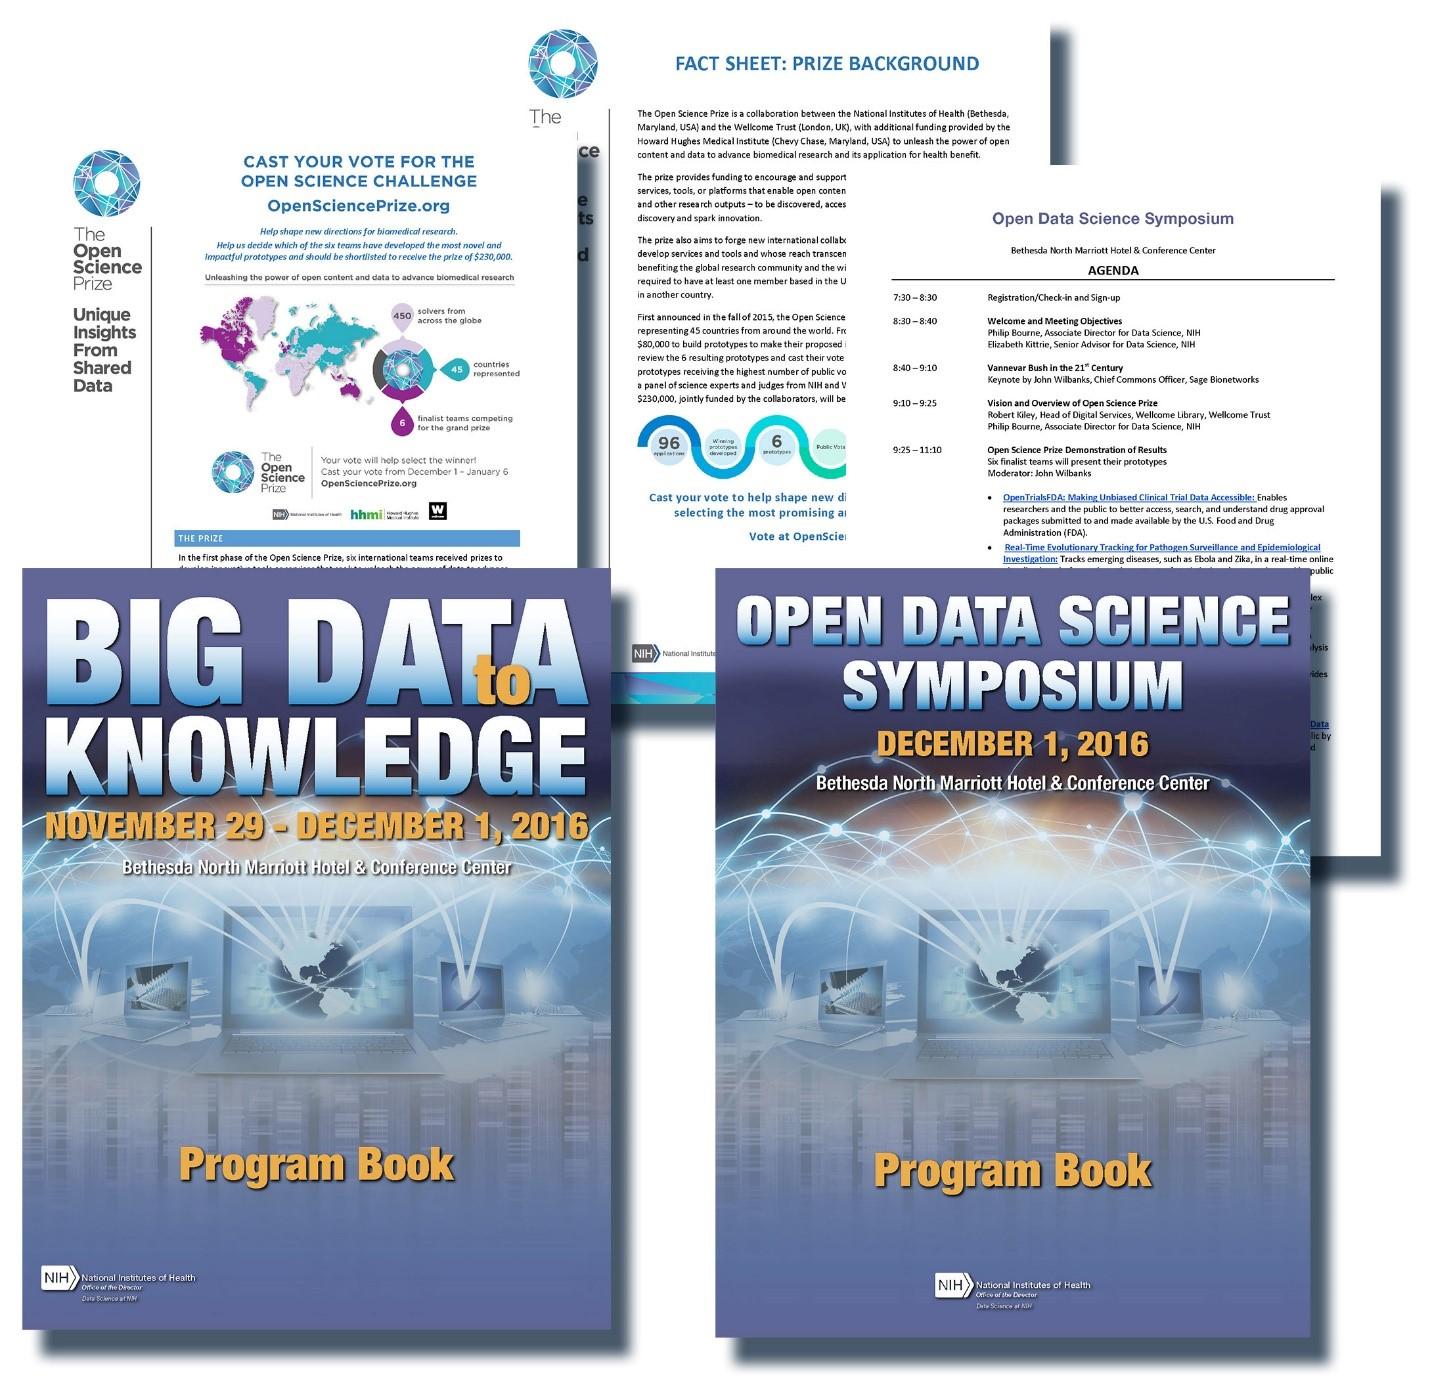 Meeting - Big Data